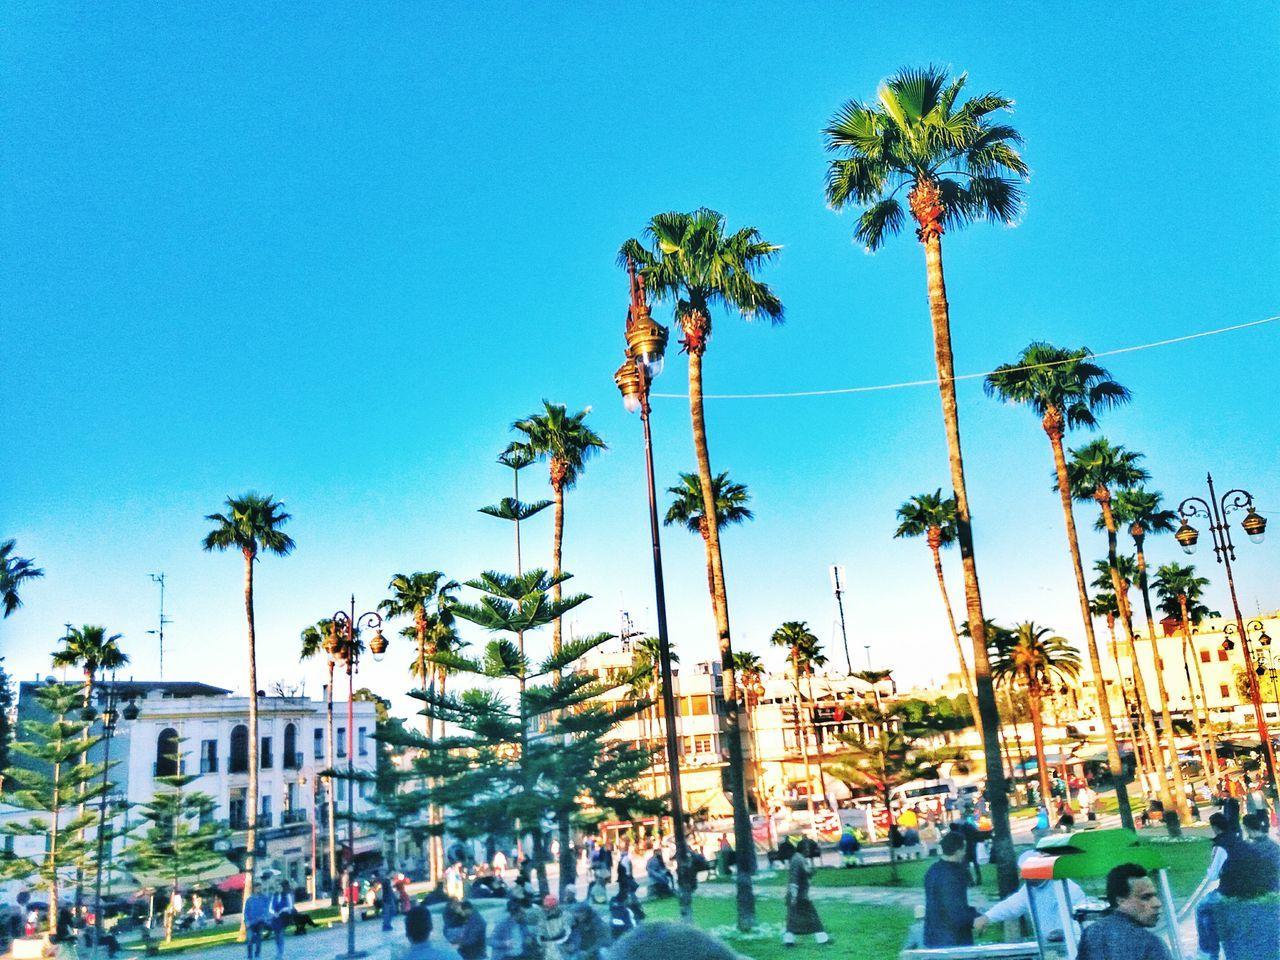 Crowd People Palms Sky Grass Tanger  EyeEmNewHere Sky Scenics Outdoors Tree Lighting Equipment Happiness